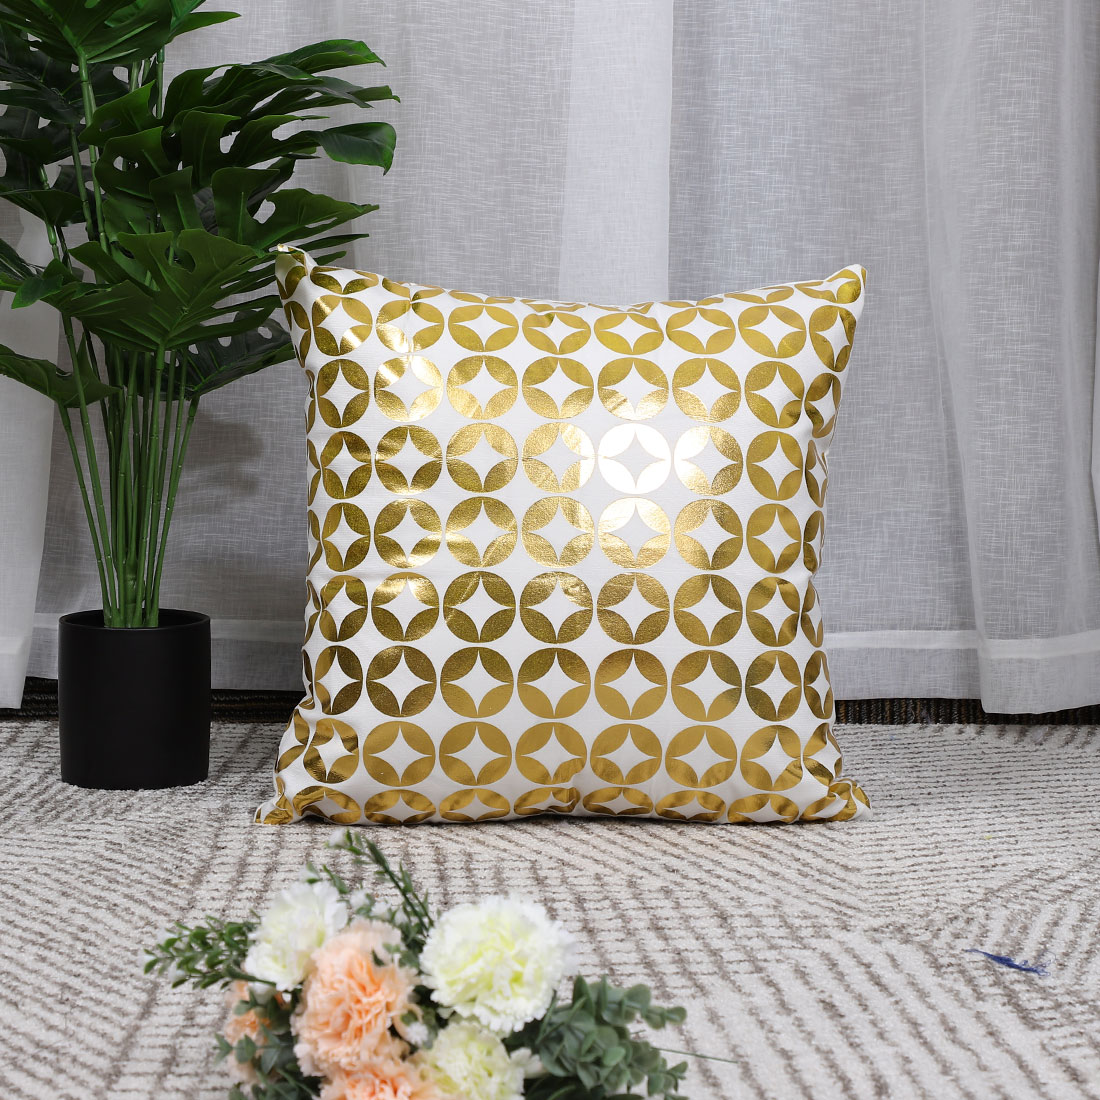 Decoration-Pillow-Covers-Cotton-Linen-Throw-Pillow-Case-Cushion-Cover thumbnail 27